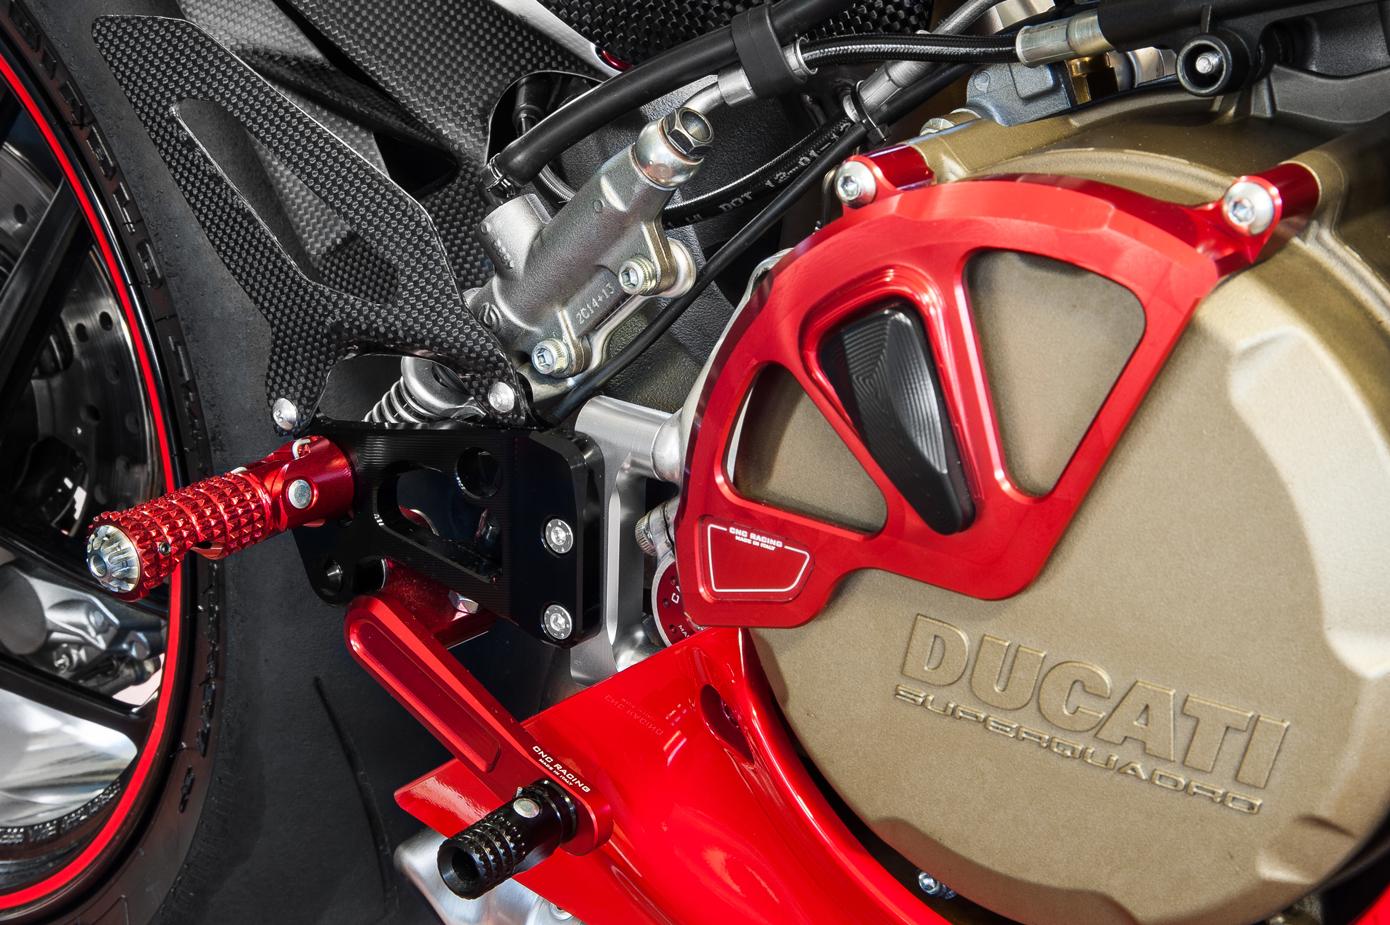 cnc racing adjustable rear sets ducati 899 959 1199 1299. Black Bedroom Furniture Sets. Home Design Ideas